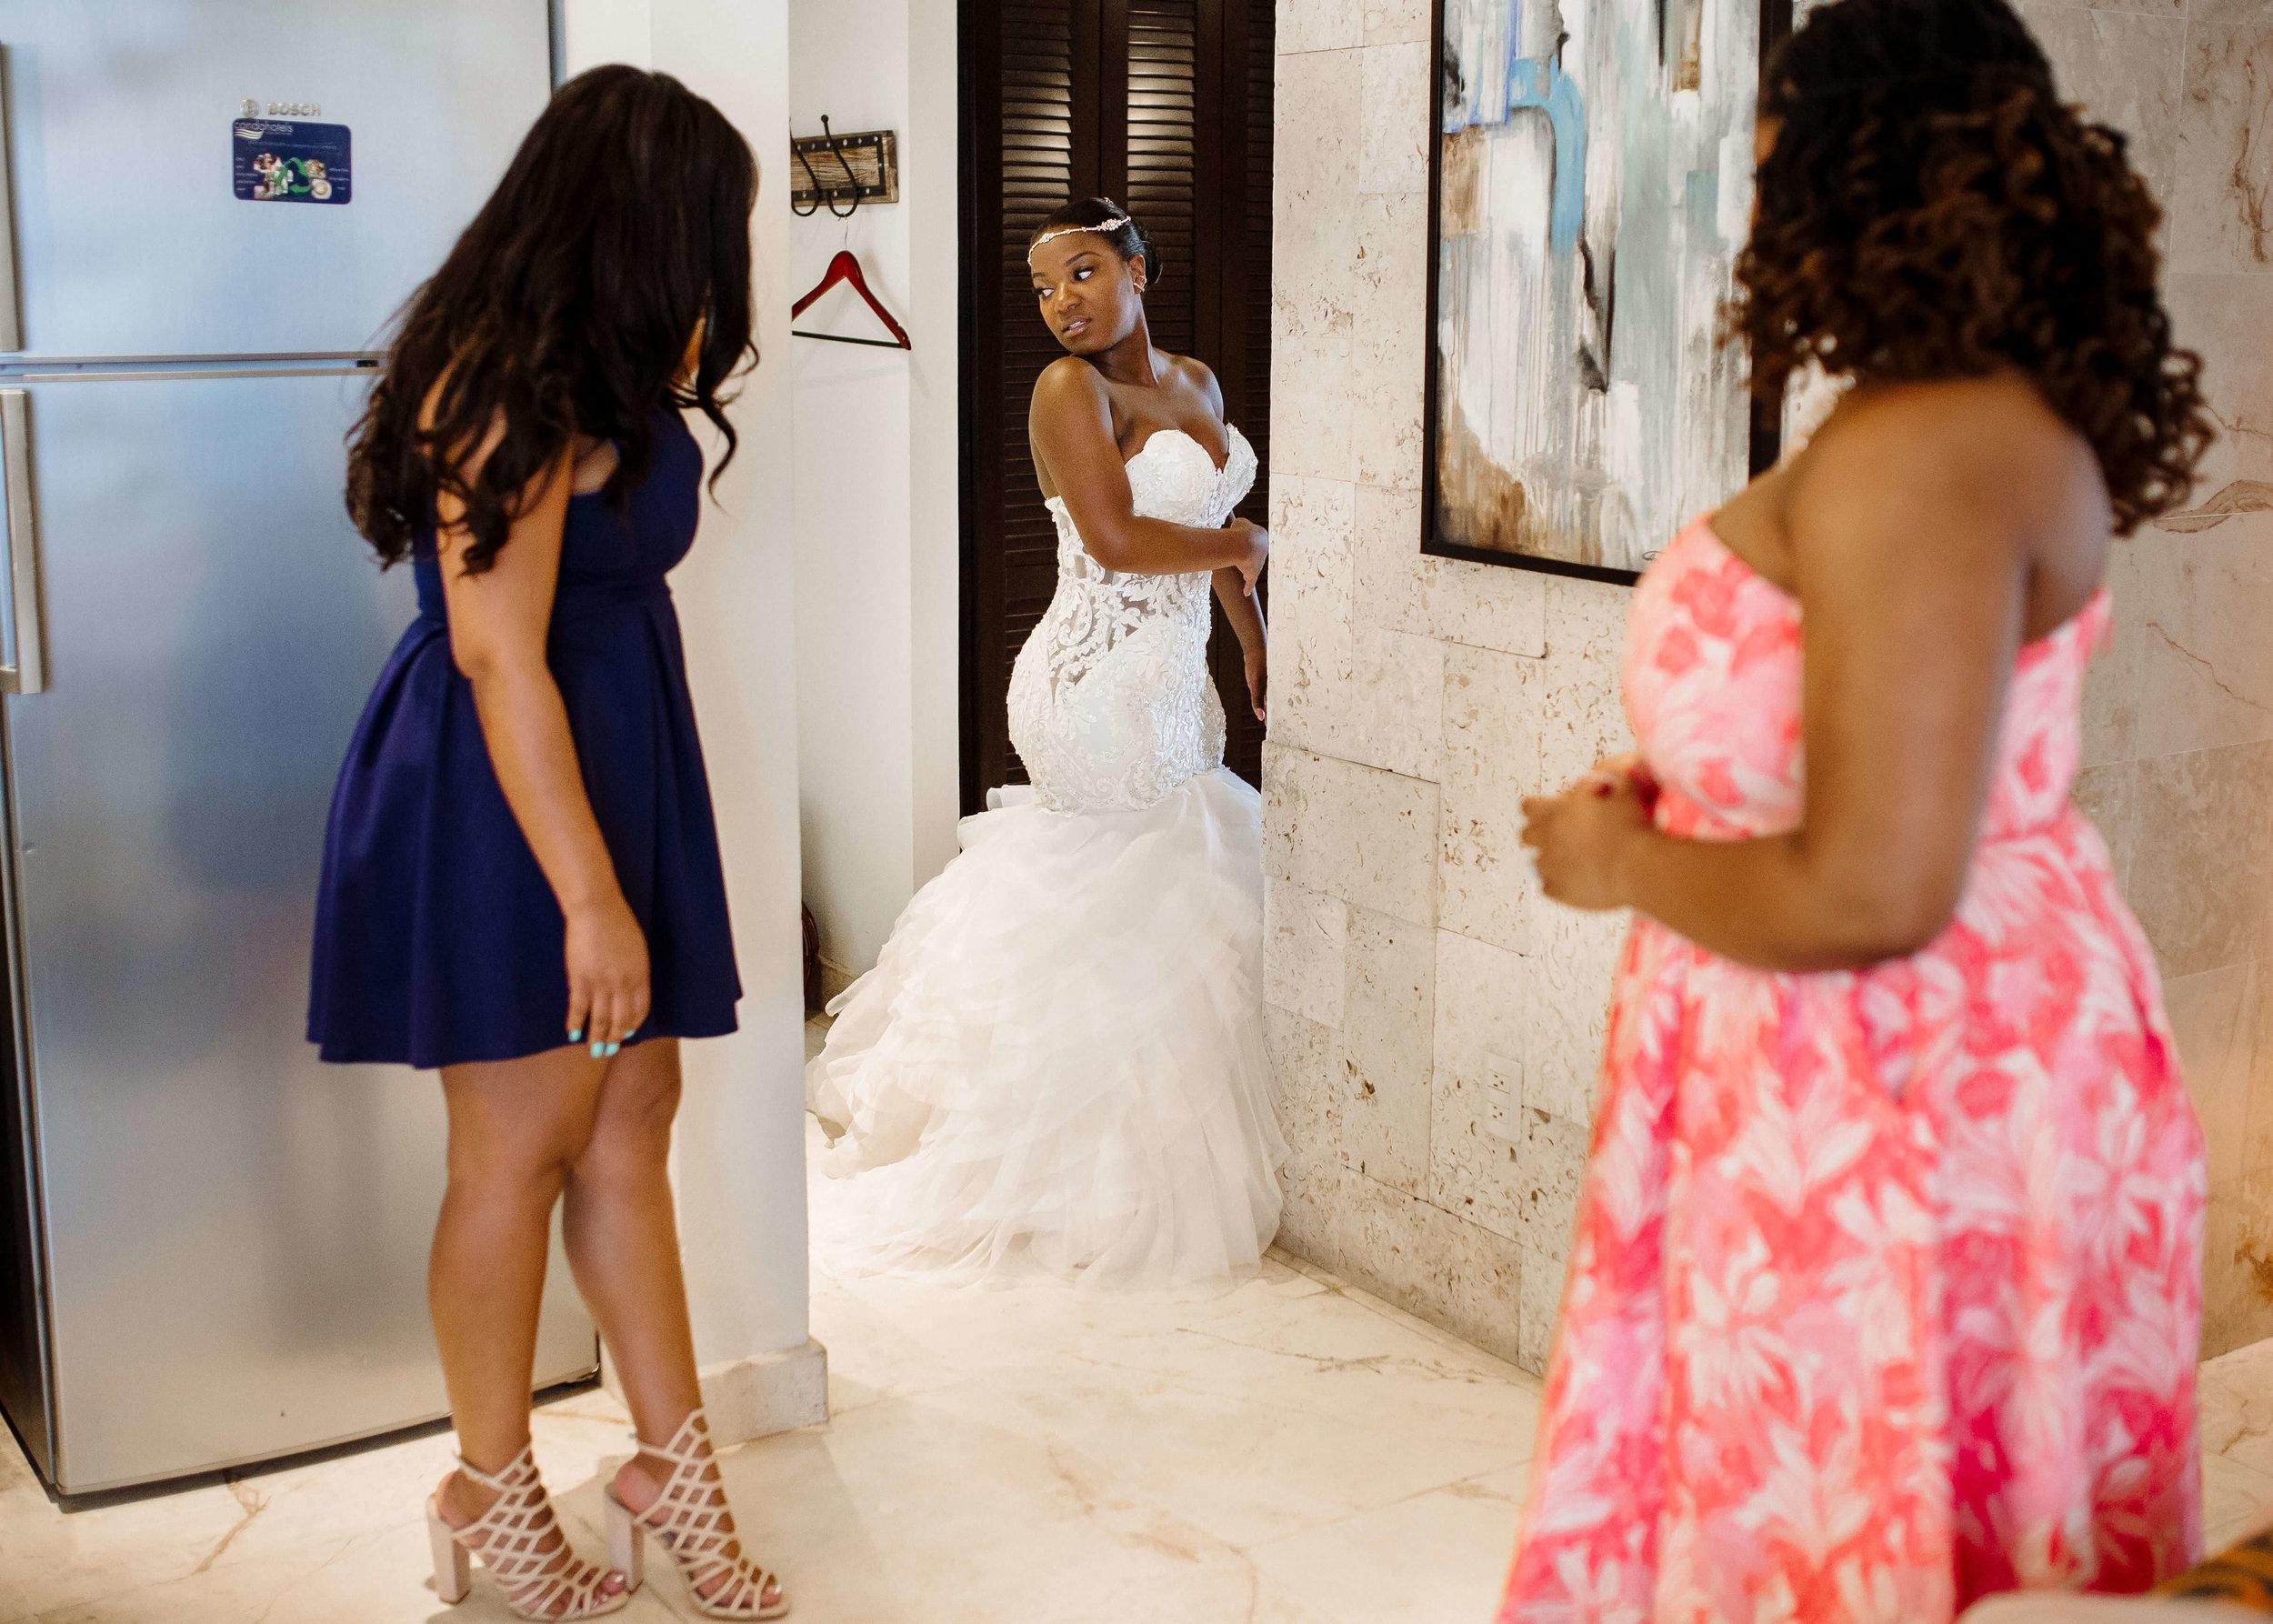 destiland-desti-sweating-for-the-destination-wedding-ready-workouts-2019-booty.jpg